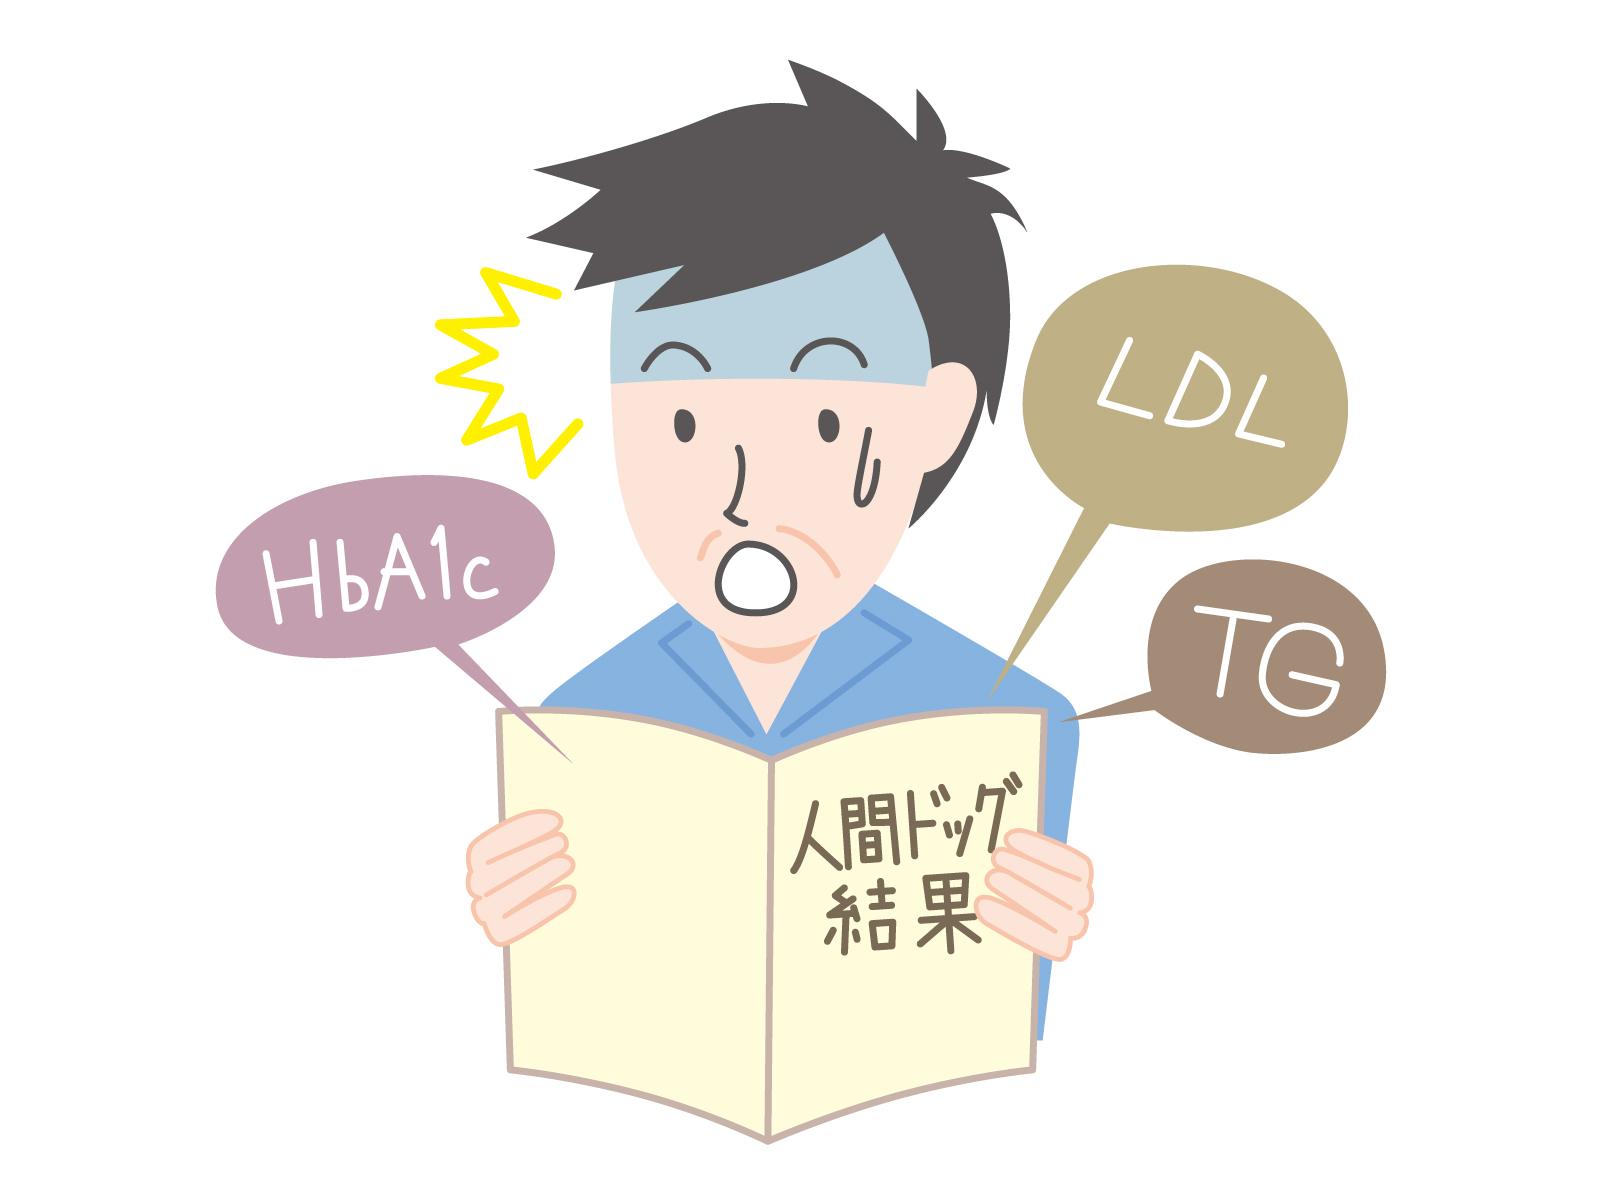 ADHDの私の学生時代を振り返る。自己肯定感が下がらなかった理由